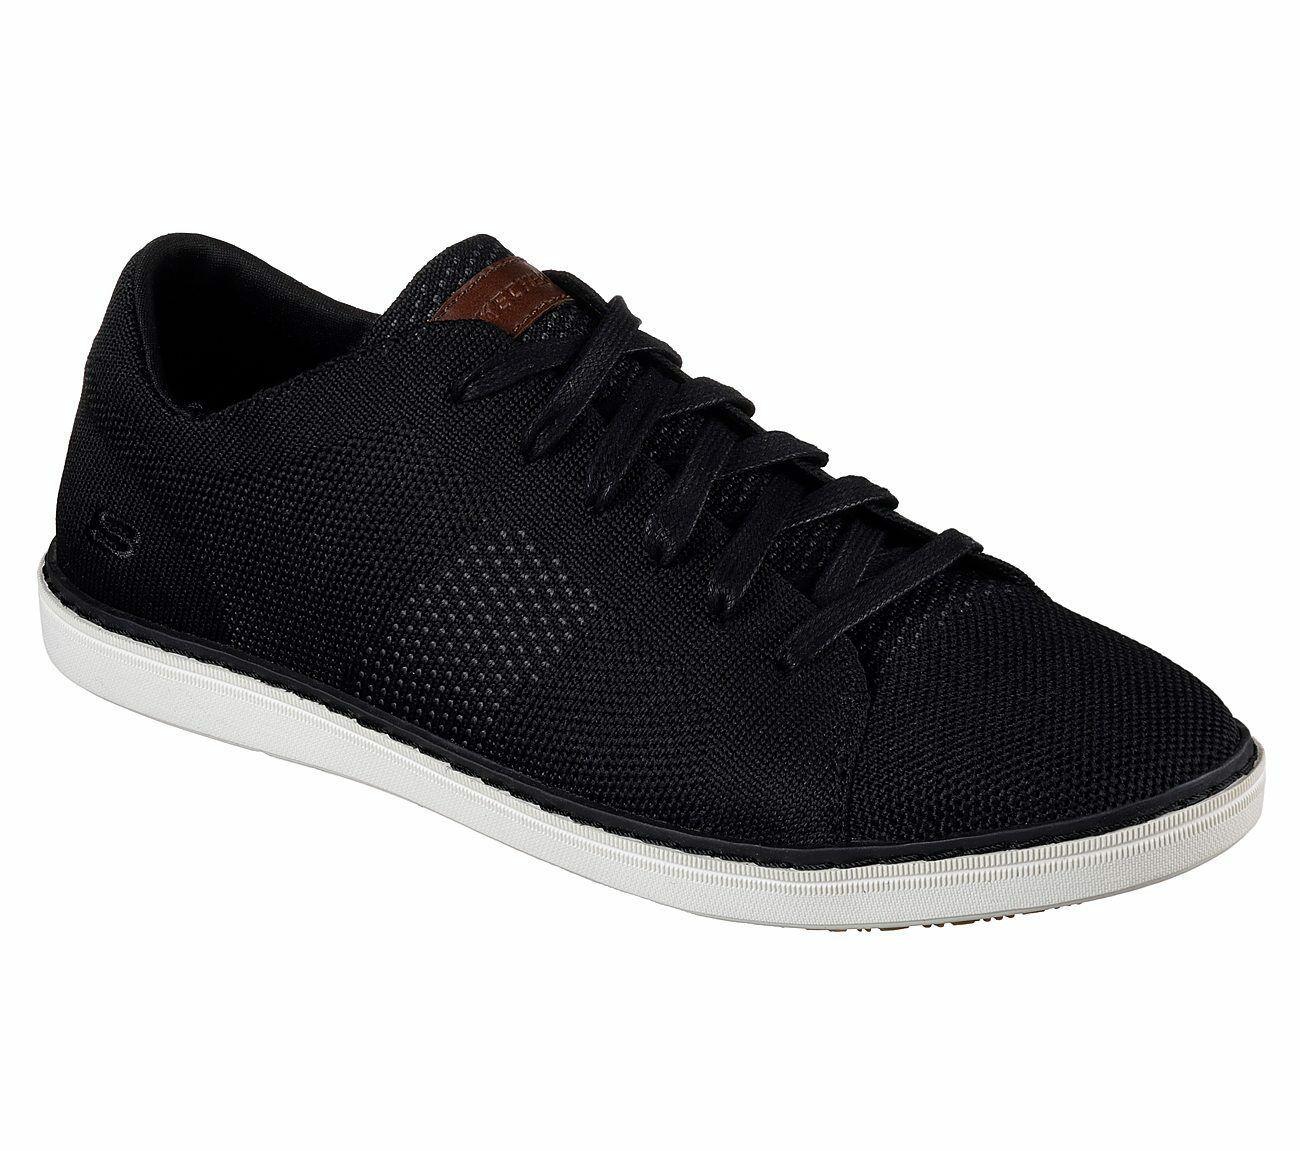 65088, SKECHERS, Lanson Revero, USA Men's Lace Up, Classic Fit, Casual Shoes image 3